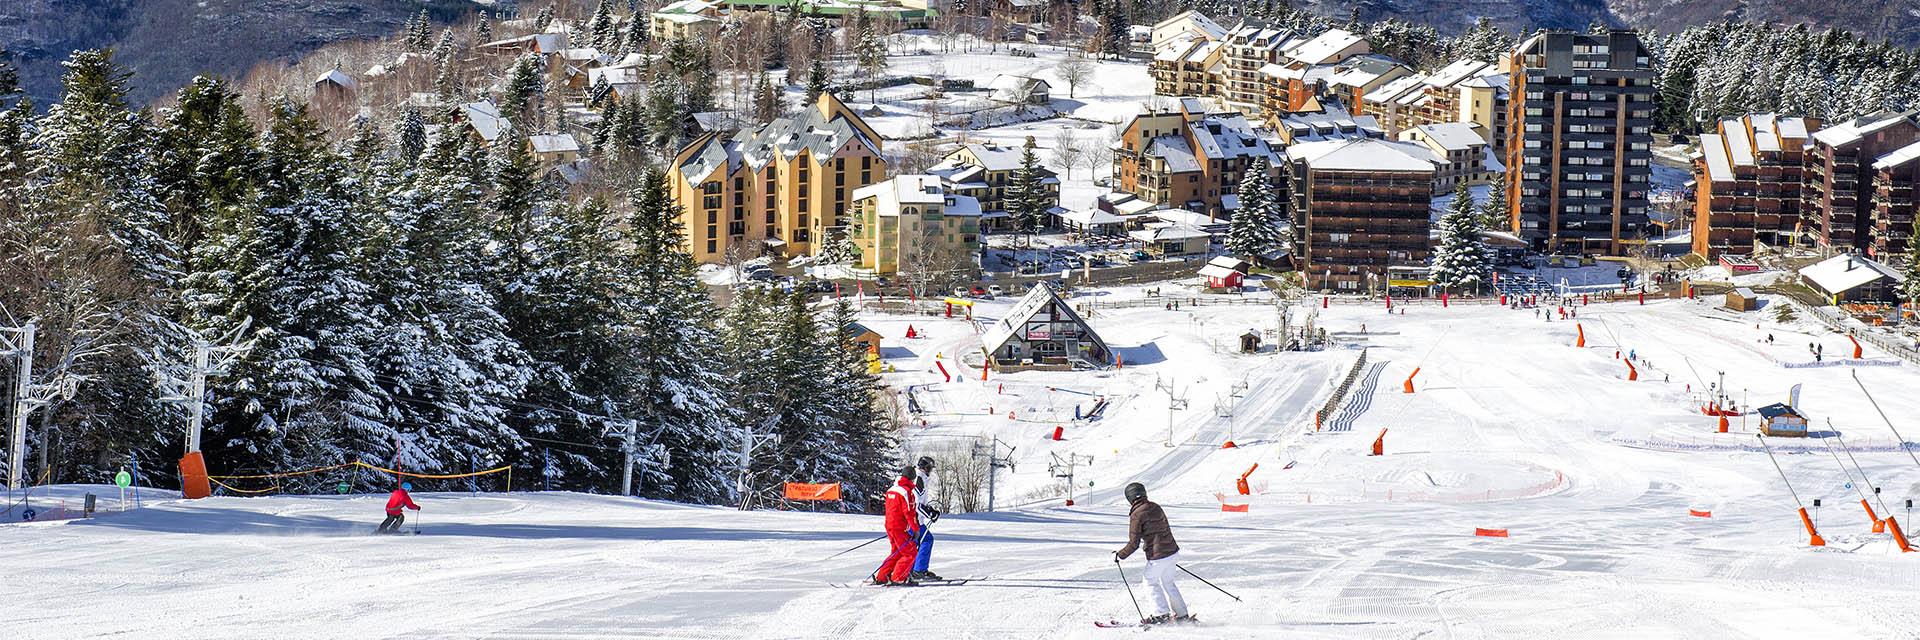 Village_club_vacances_pyrenees-tarbesou-ski